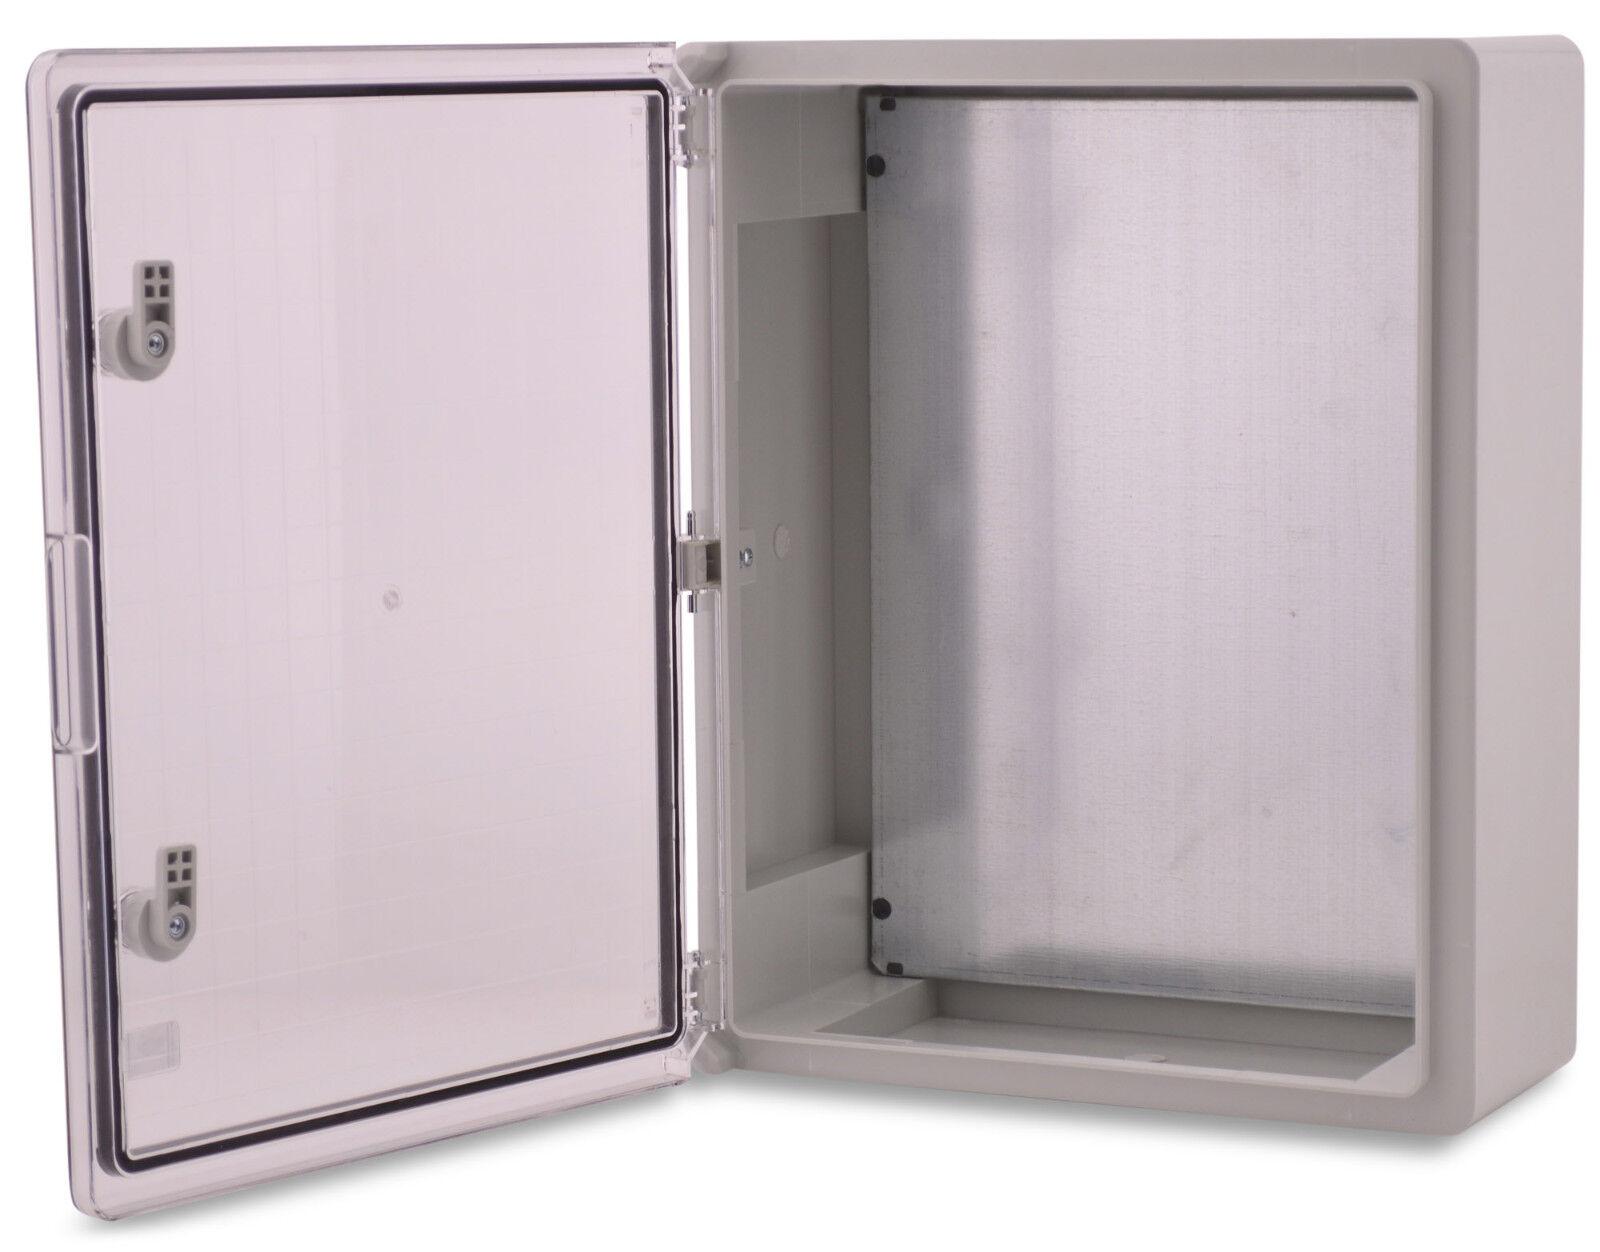 Boxexpert Placard-Boîtier série Fleet 500x400x175mm IP 65 65 65 Transparent Gris e6a562